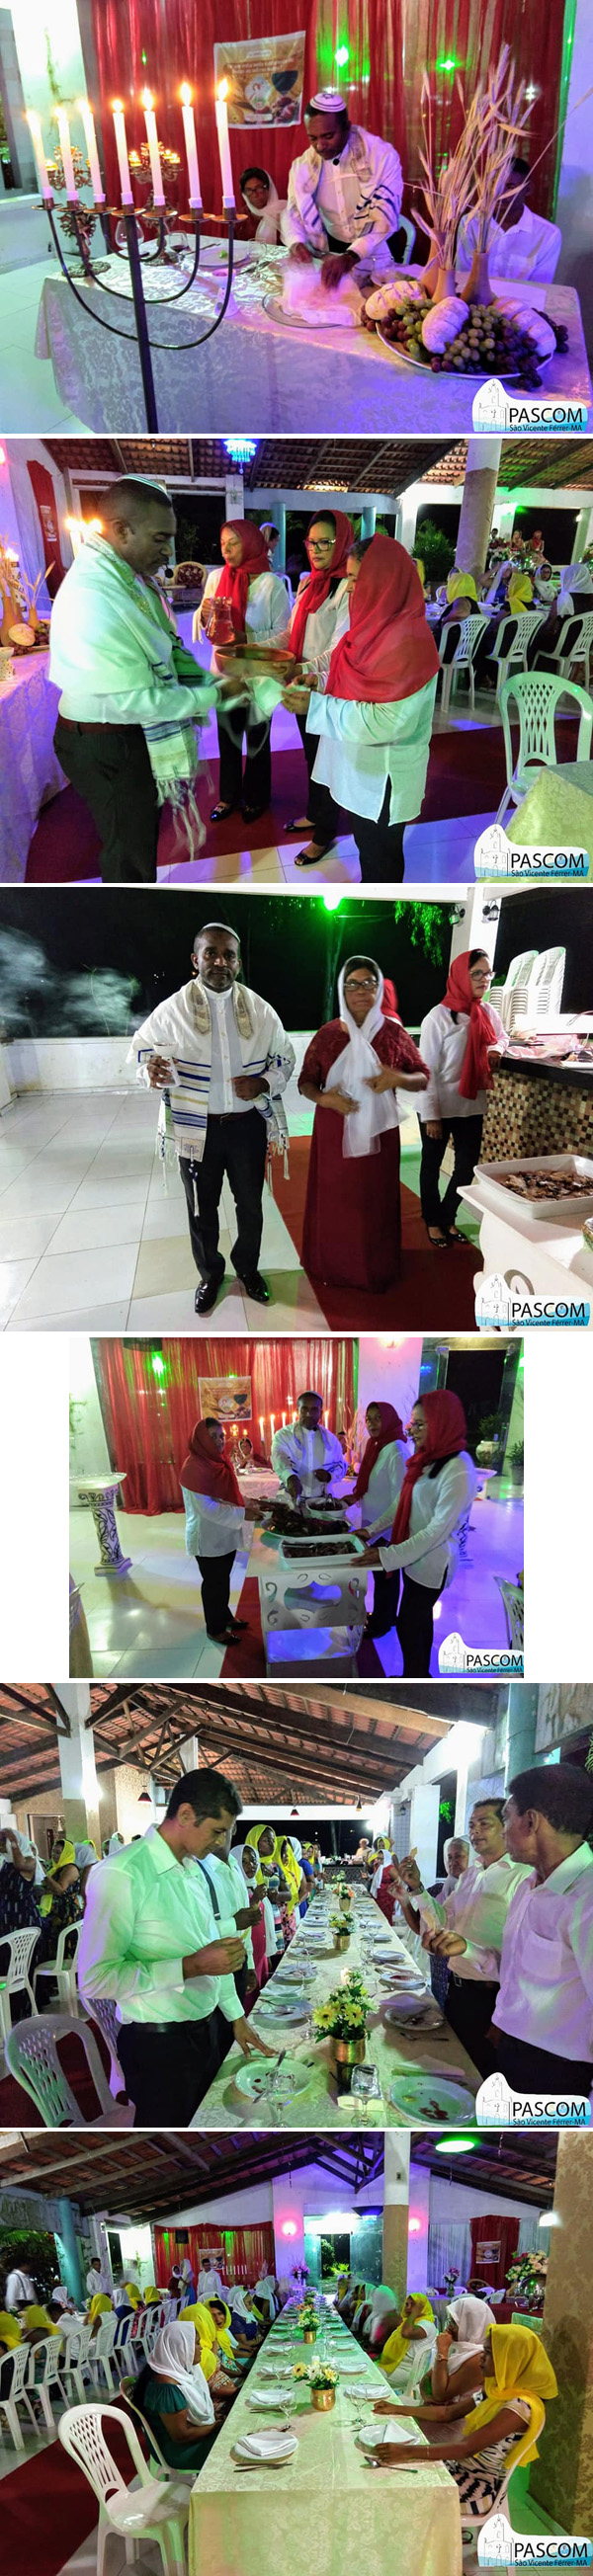 Ceremonia católica judía - Passah 2